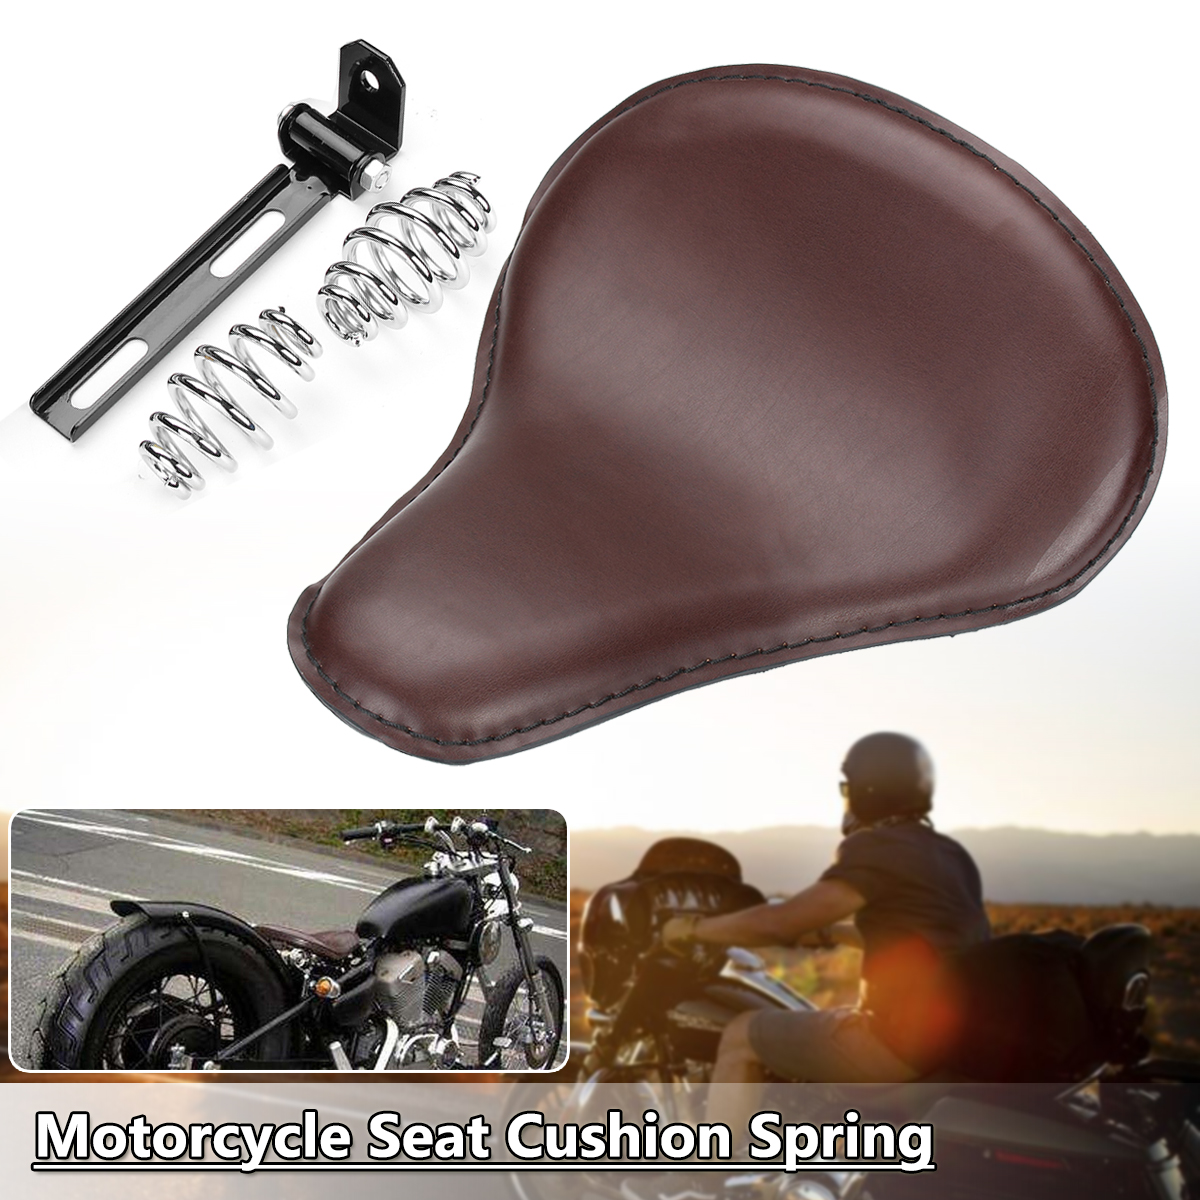 Universal Motorcycle Saddle Solo Seat Cushion Spring Flat Leather Style for Harley/Honda/Yamaha/Kawasaki universal motorcycle crocodile leather style saddle solo seat cushion spring for harley honda yamaha kawasaki